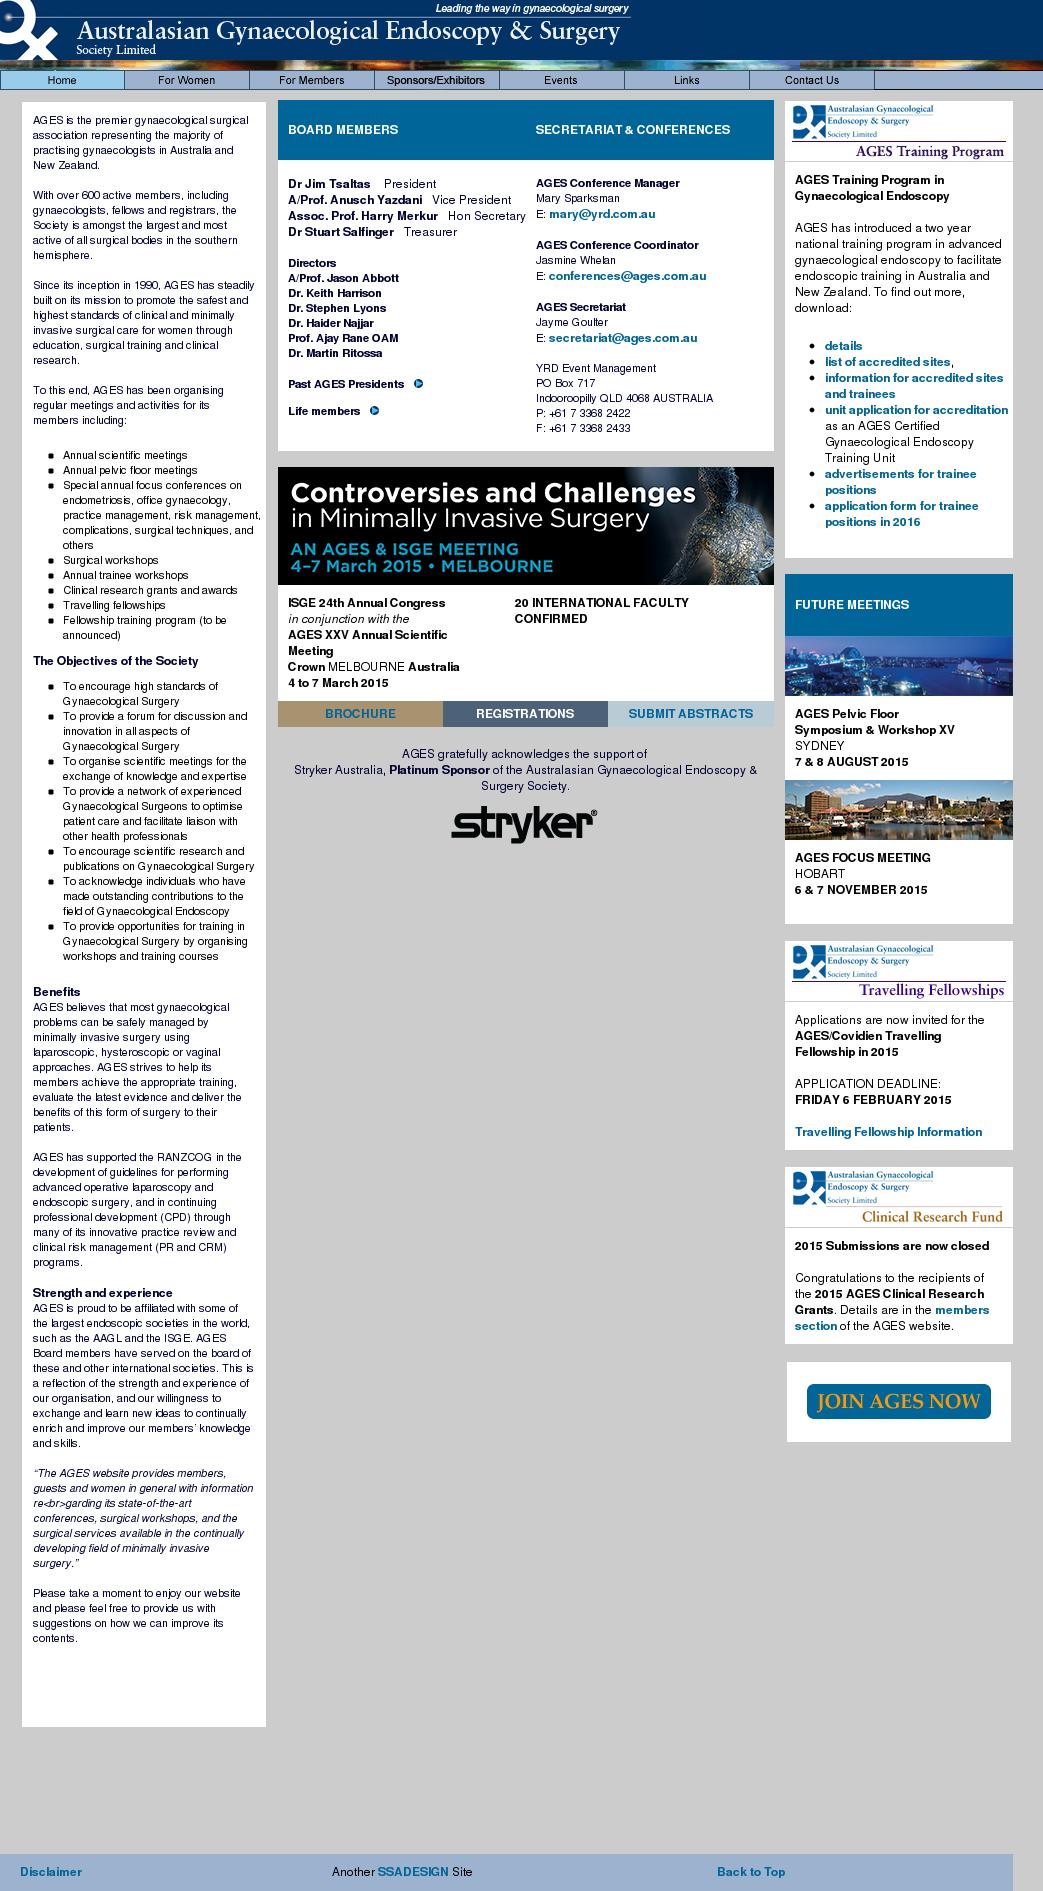 Australian Gynaecological Endoscopy Society Competitors